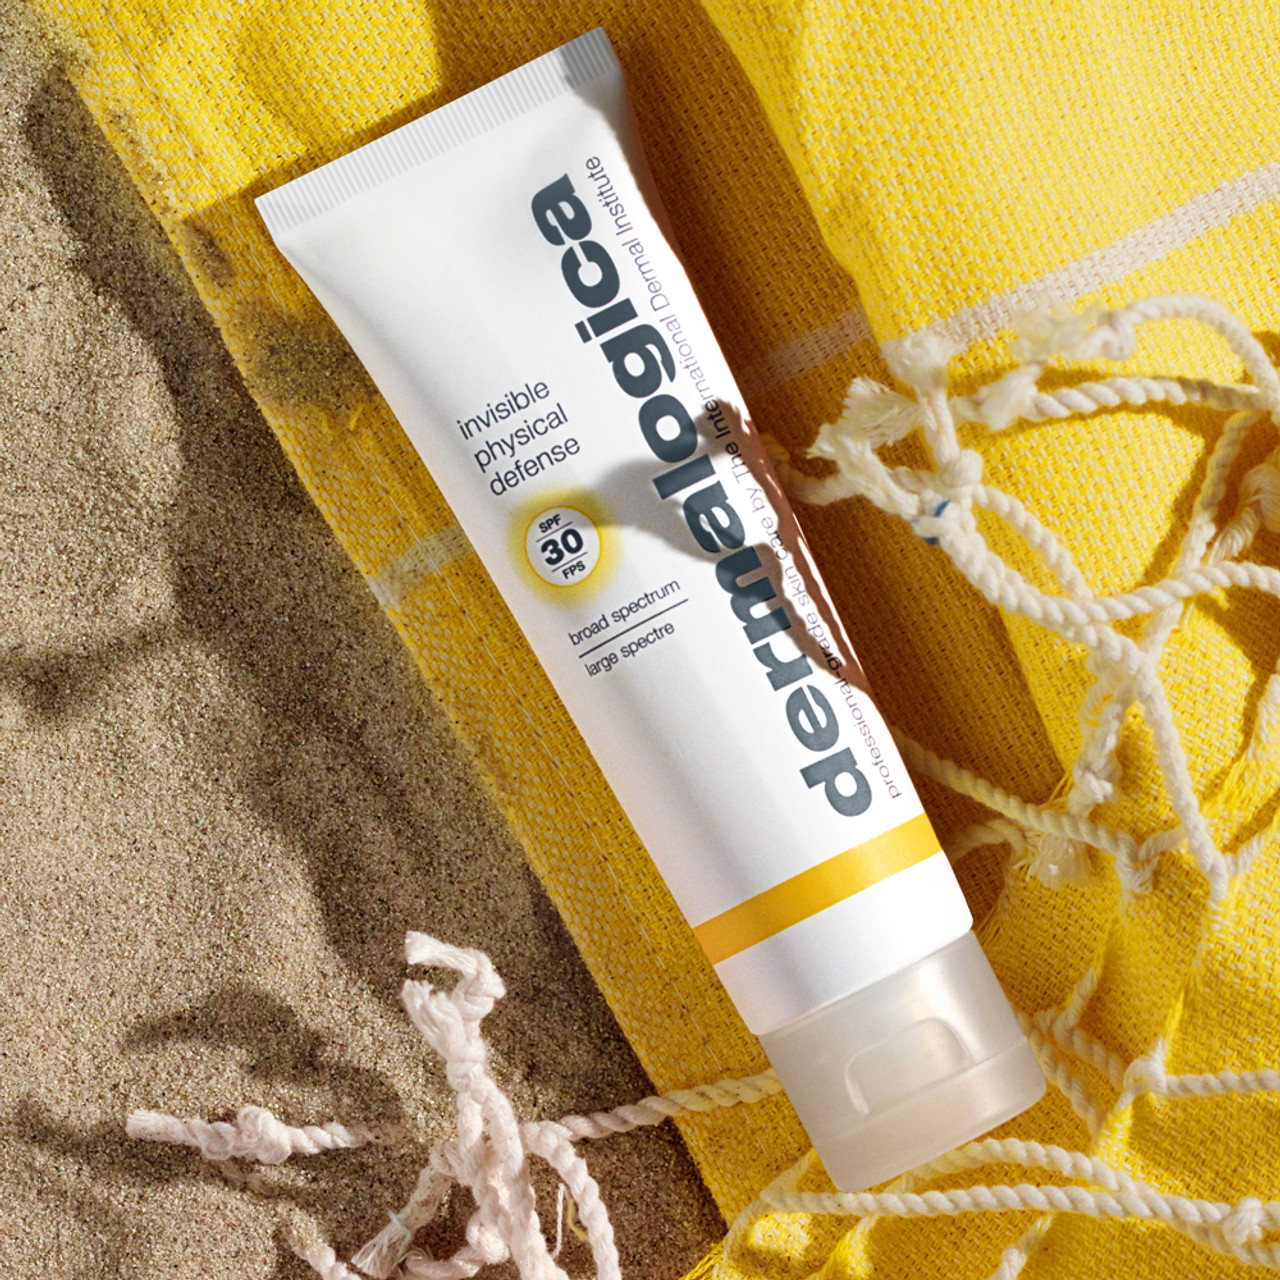 Dermalogica Invisible Physical Defense Sunscreen SPF30